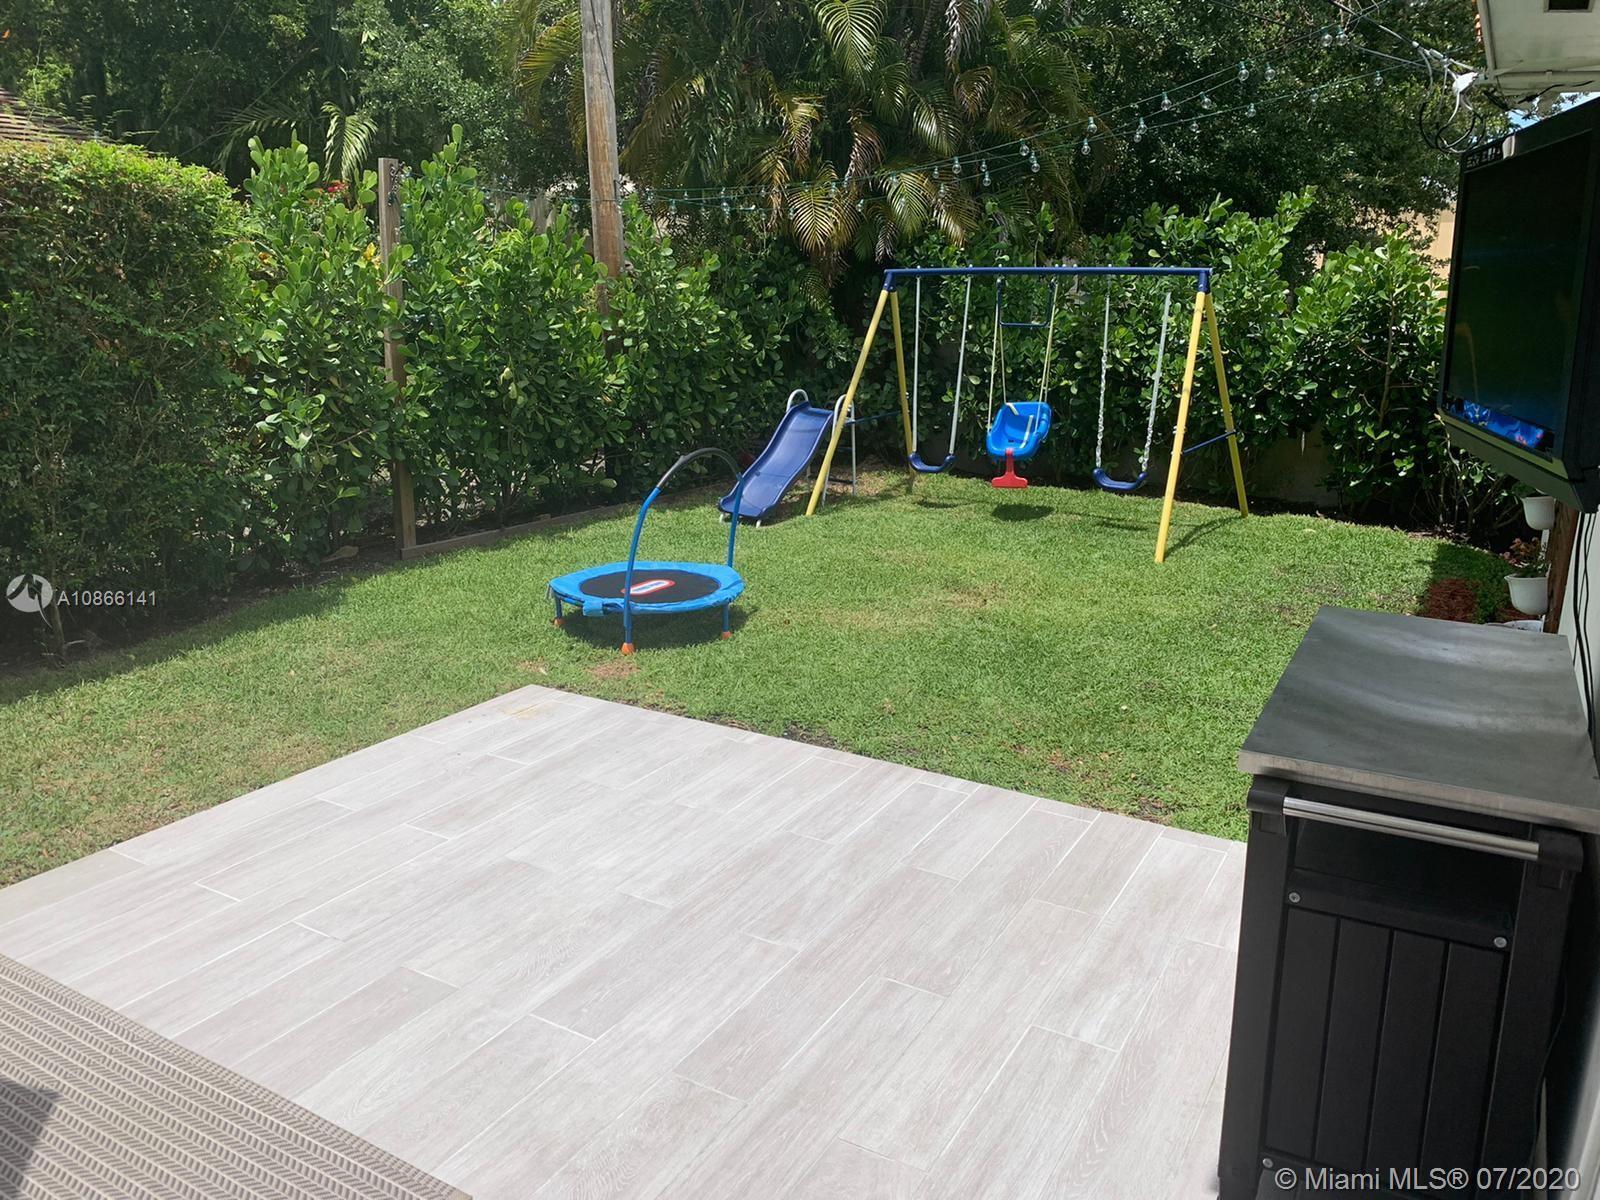 Photo - 810 Pizarro St, Coral Gables FL 33134